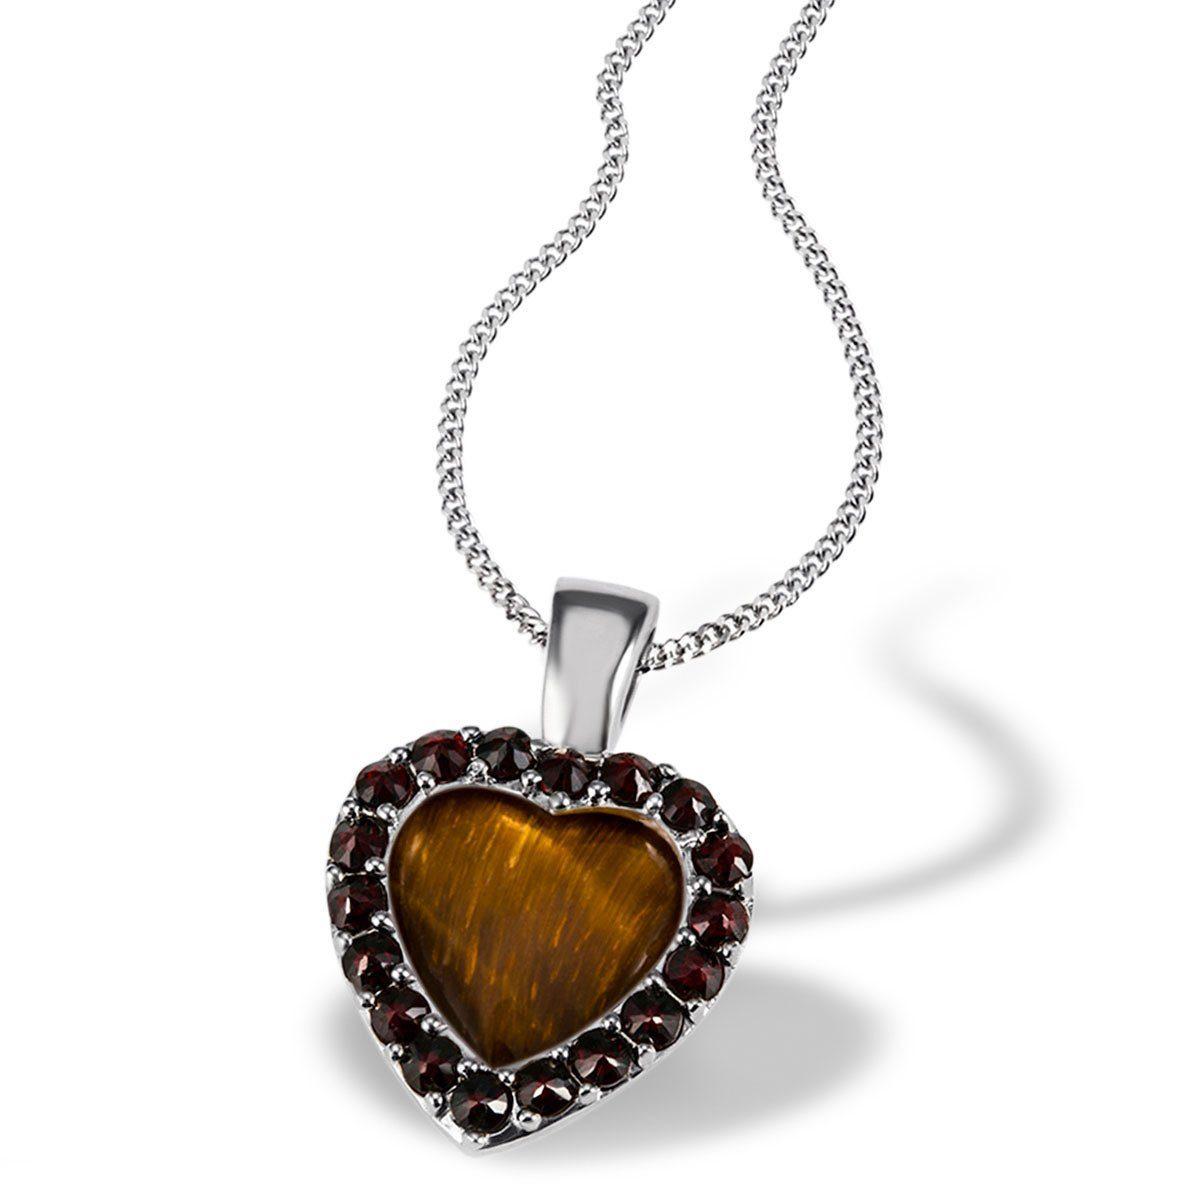 Averdin Collier 925/- Silber 18 Granaten rot-braun 1Tigerauge braun